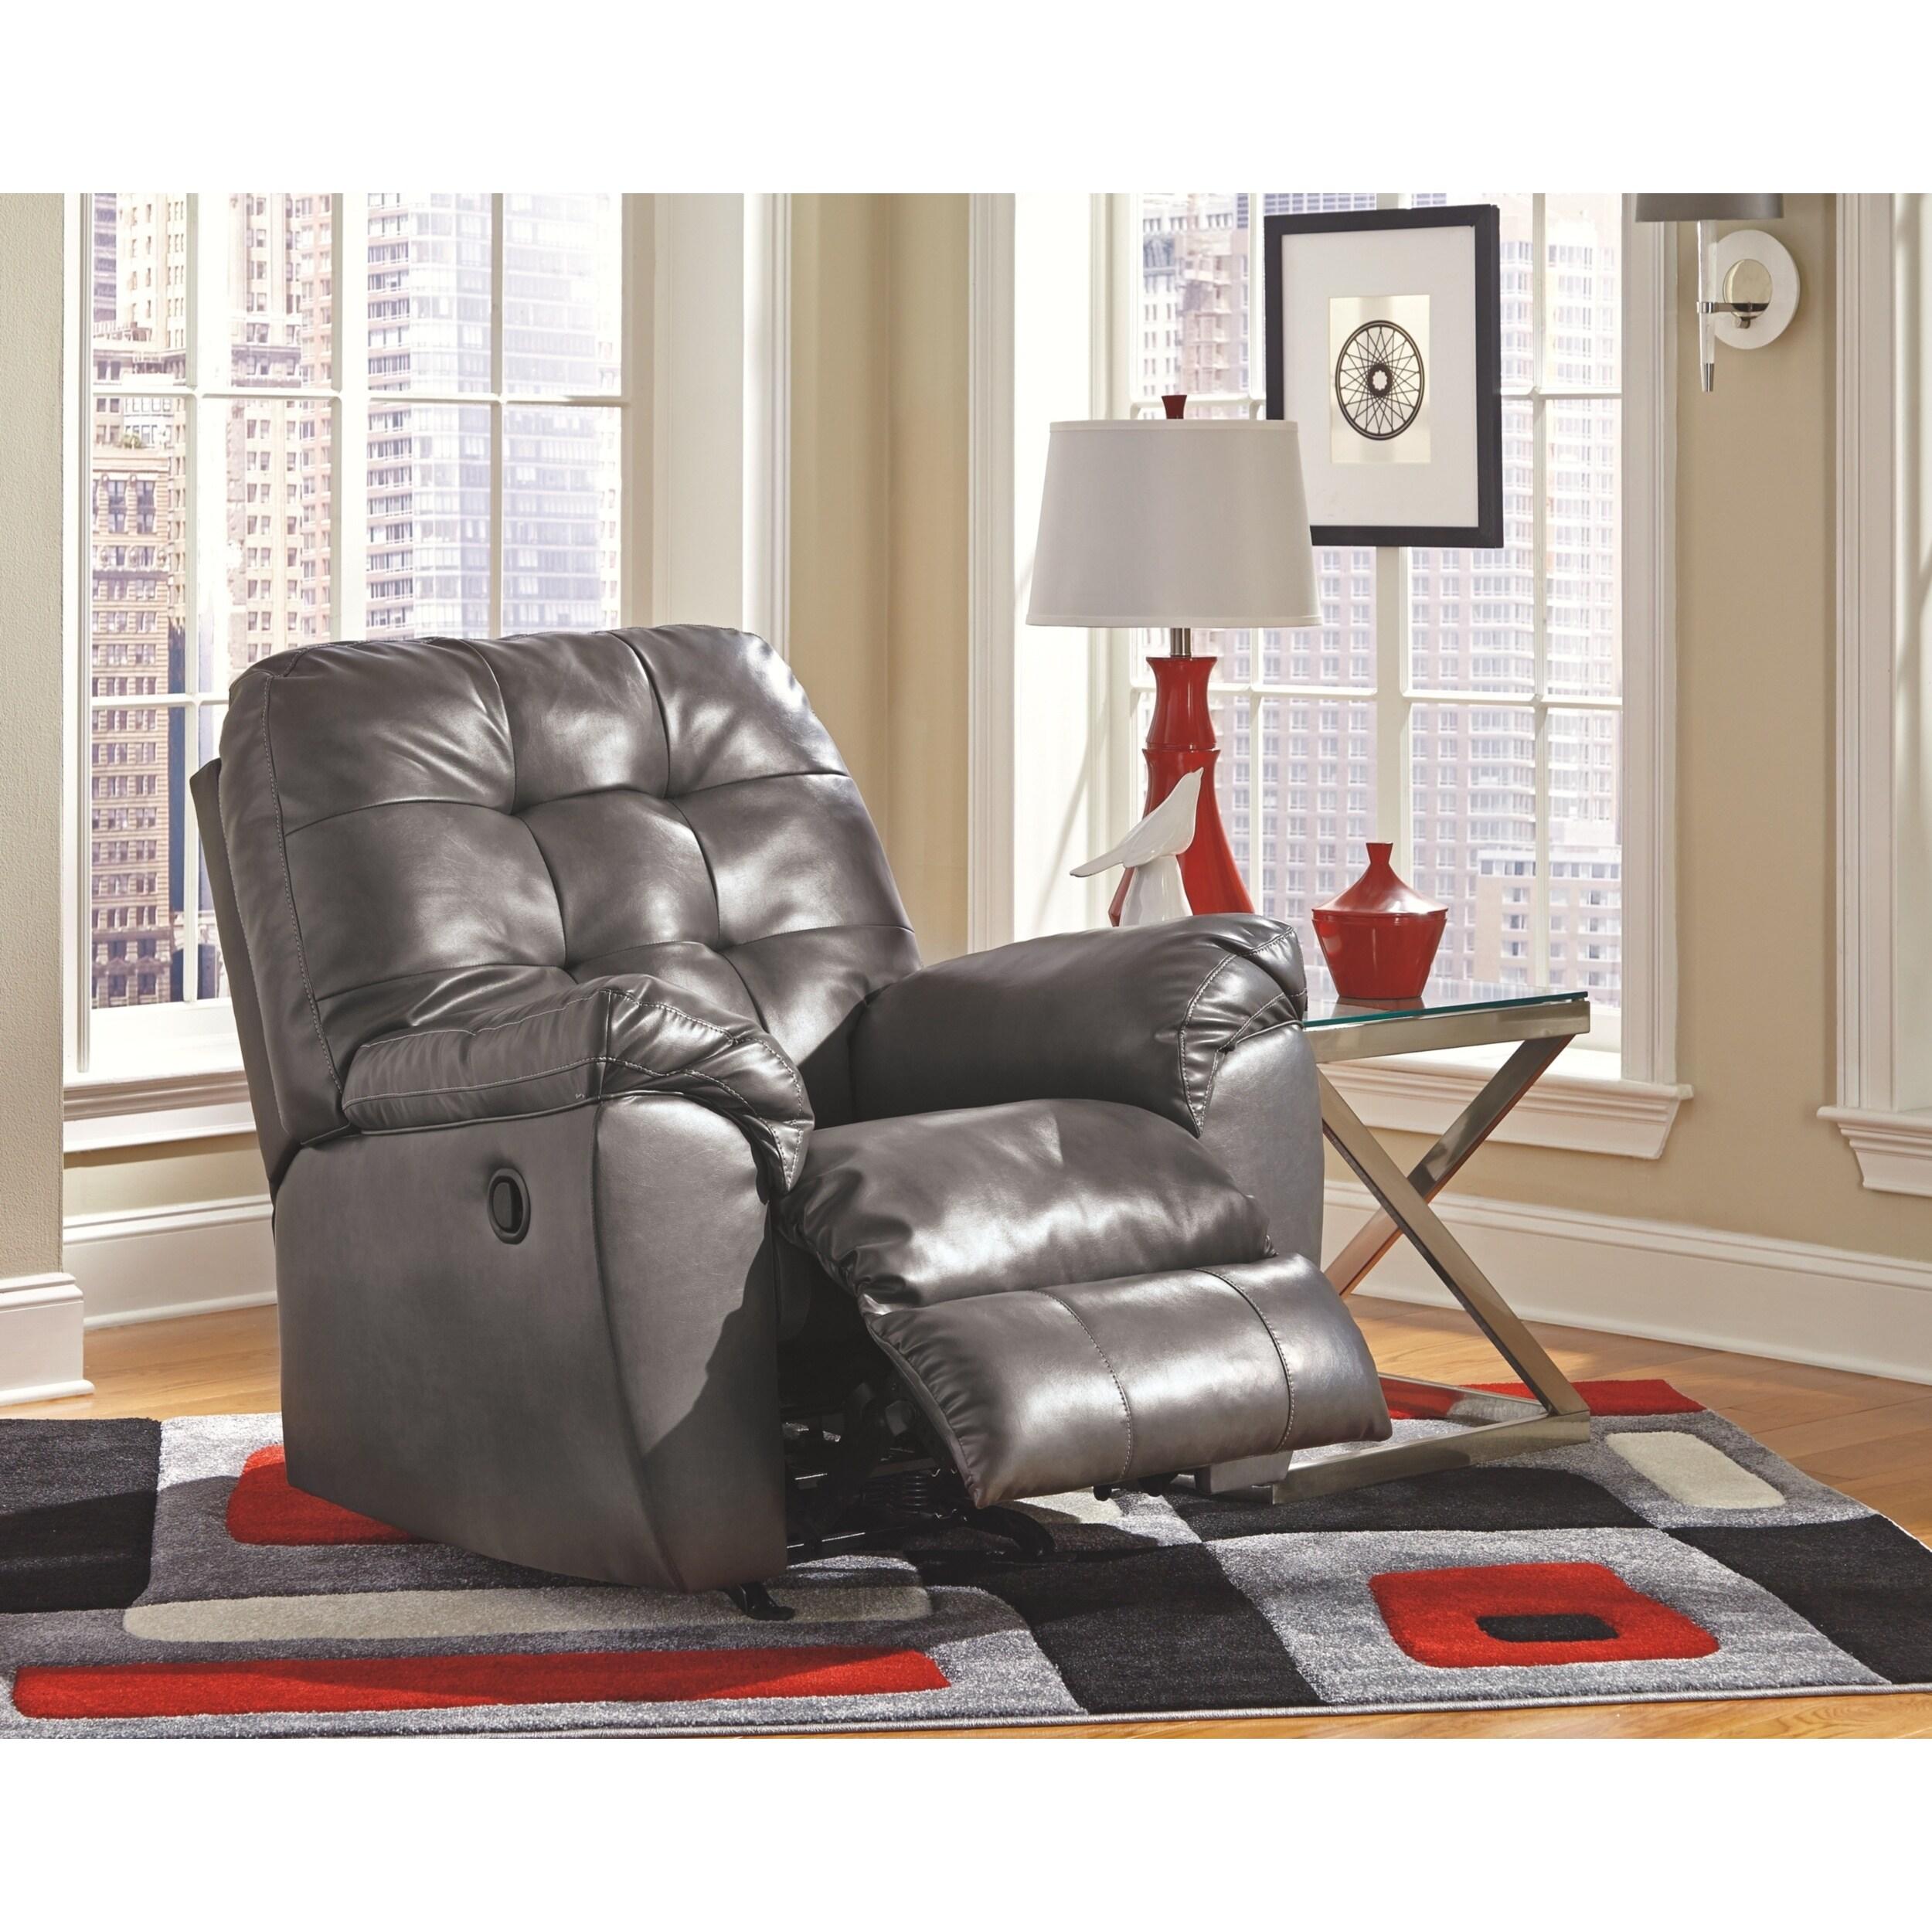 Admirable Alliston Contemporary Gray Rocker Recliner Creativecarmelina Interior Chair Design Creativecarmelinacom